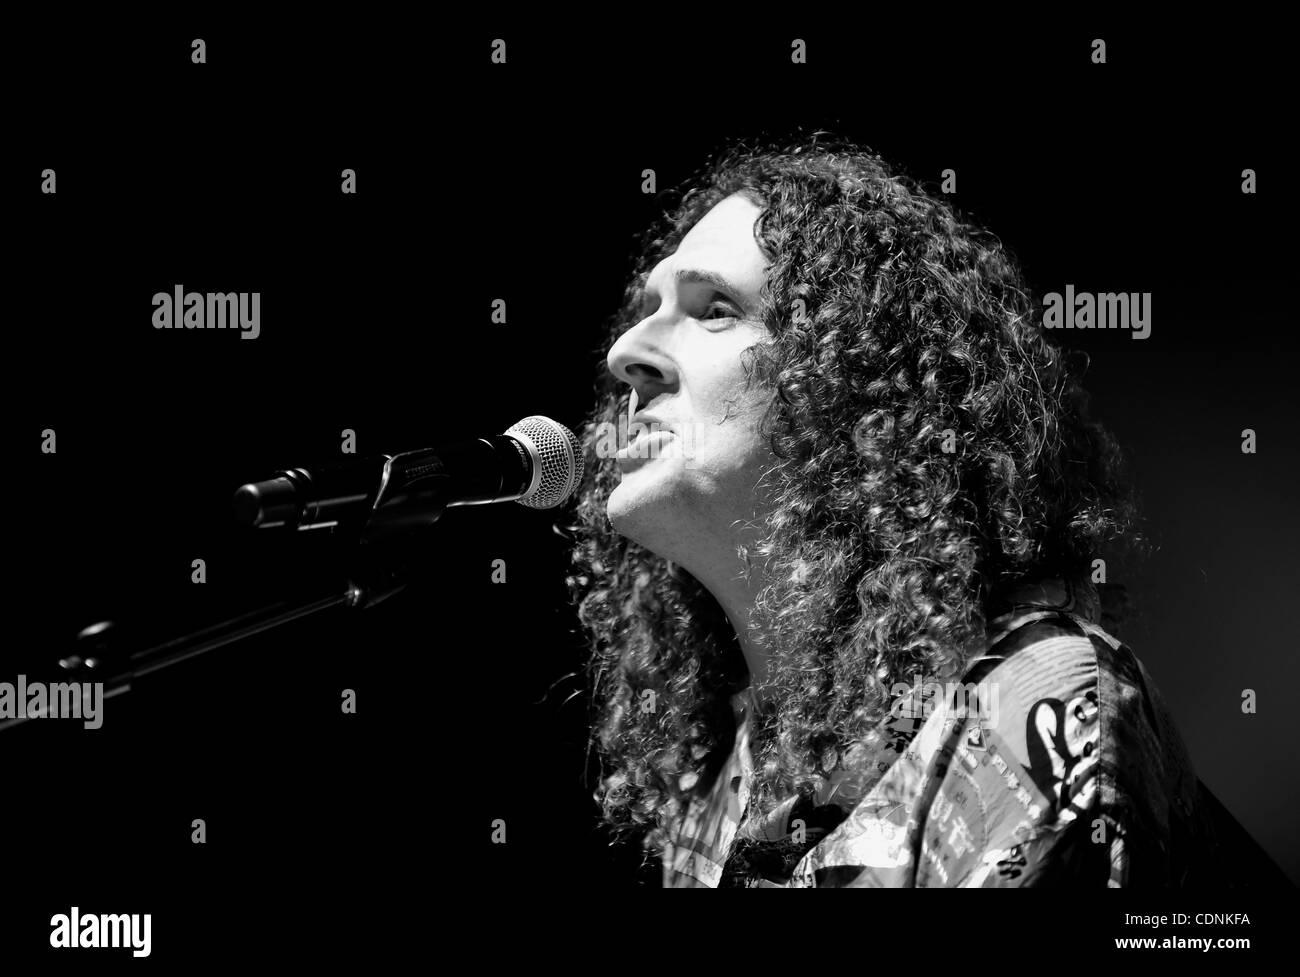 June 16, 2011 - Santa Ynez, California, U.S. - Comedy singer WEIRD ...